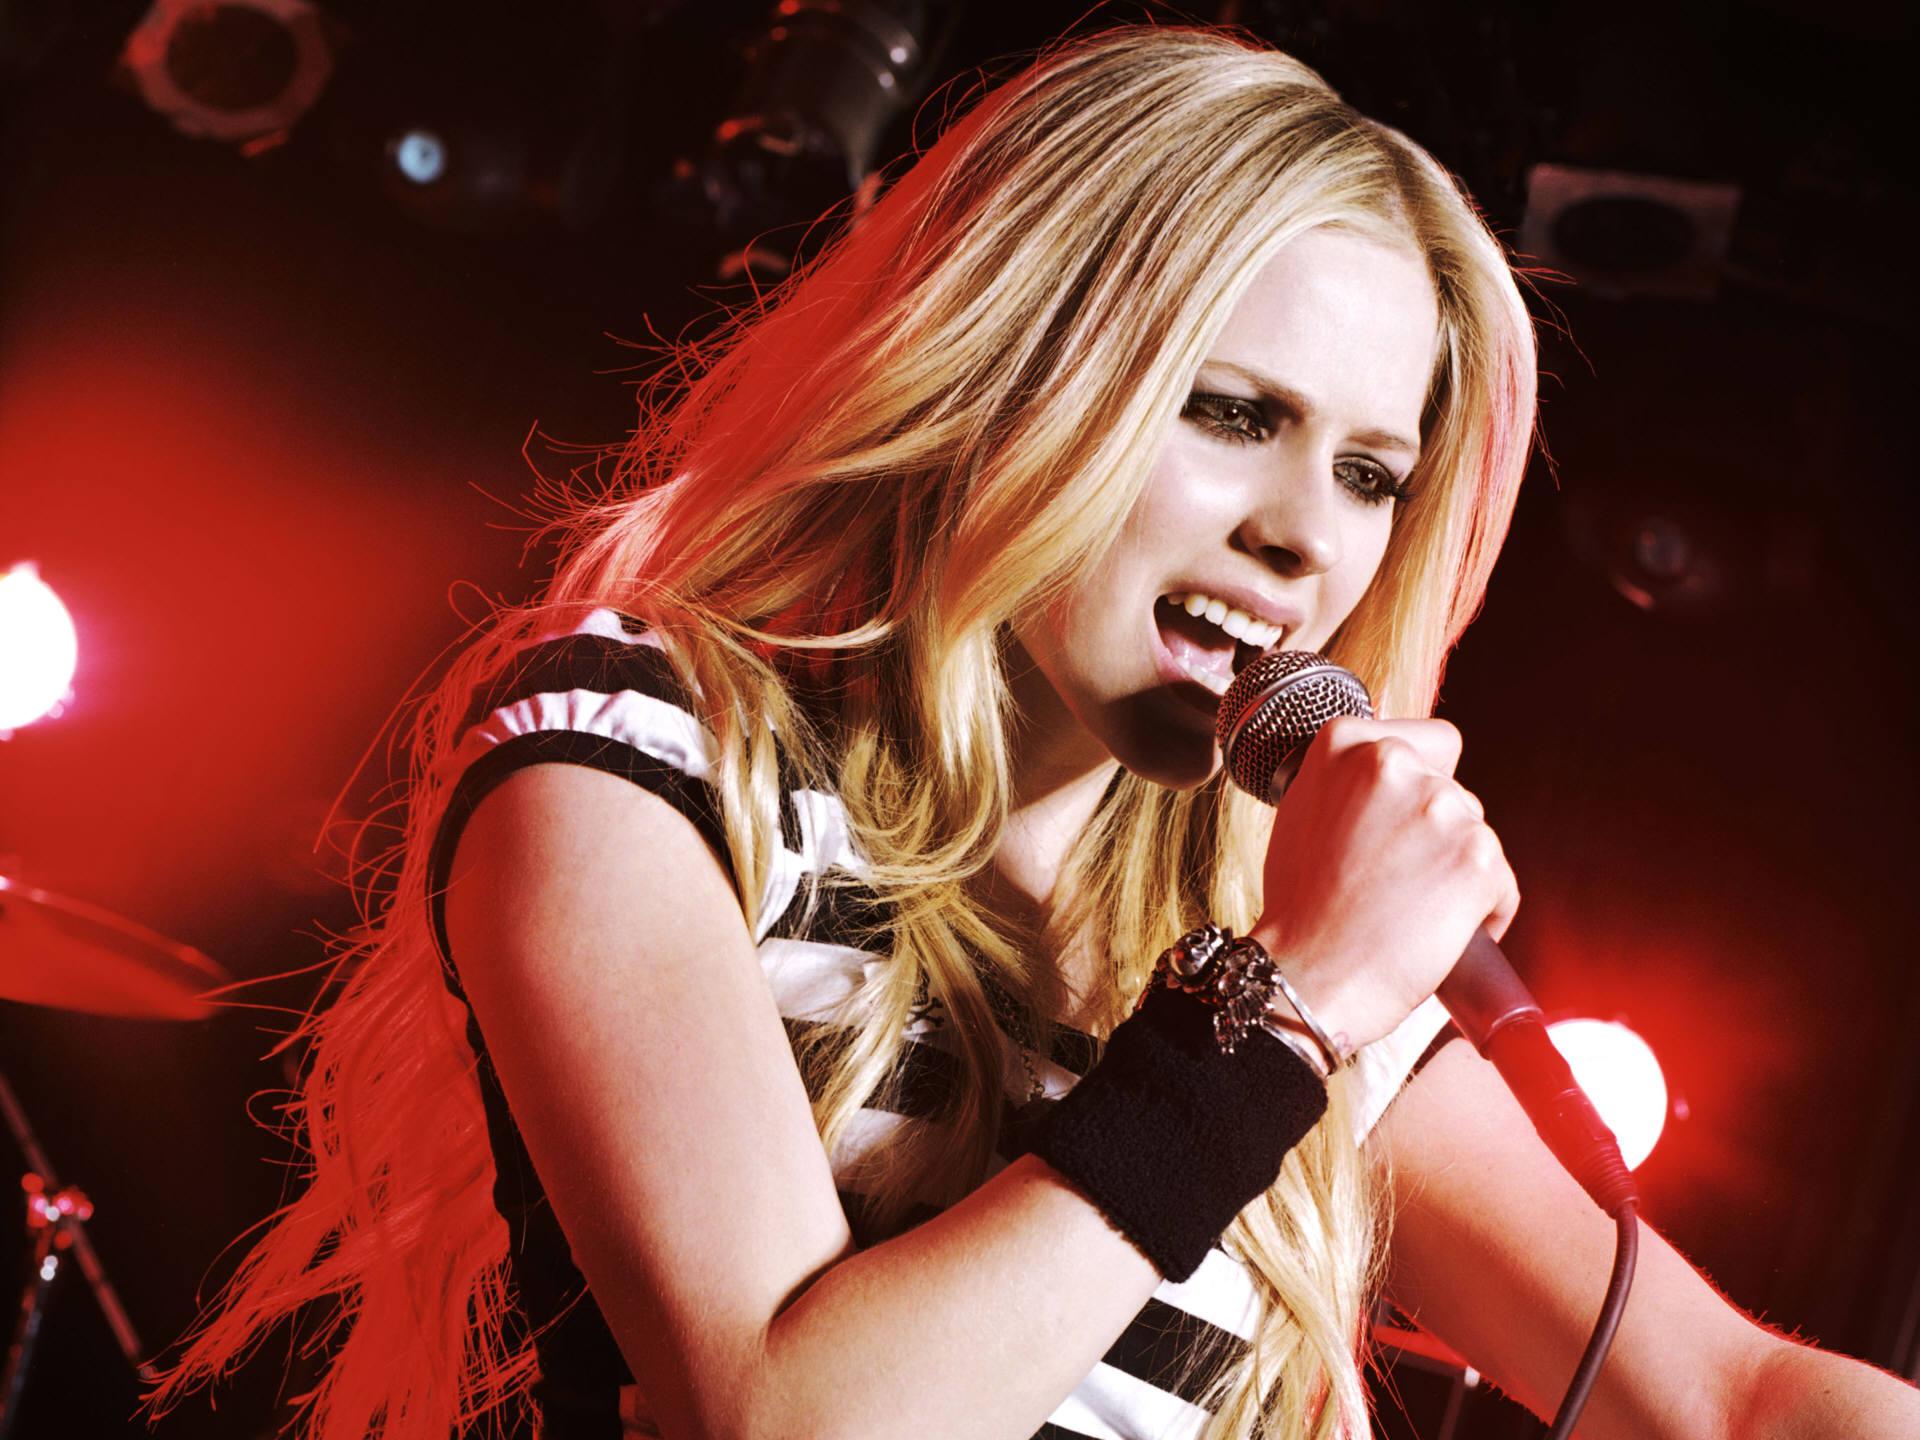 HD Wallpapers Avril Lavigne Live HD